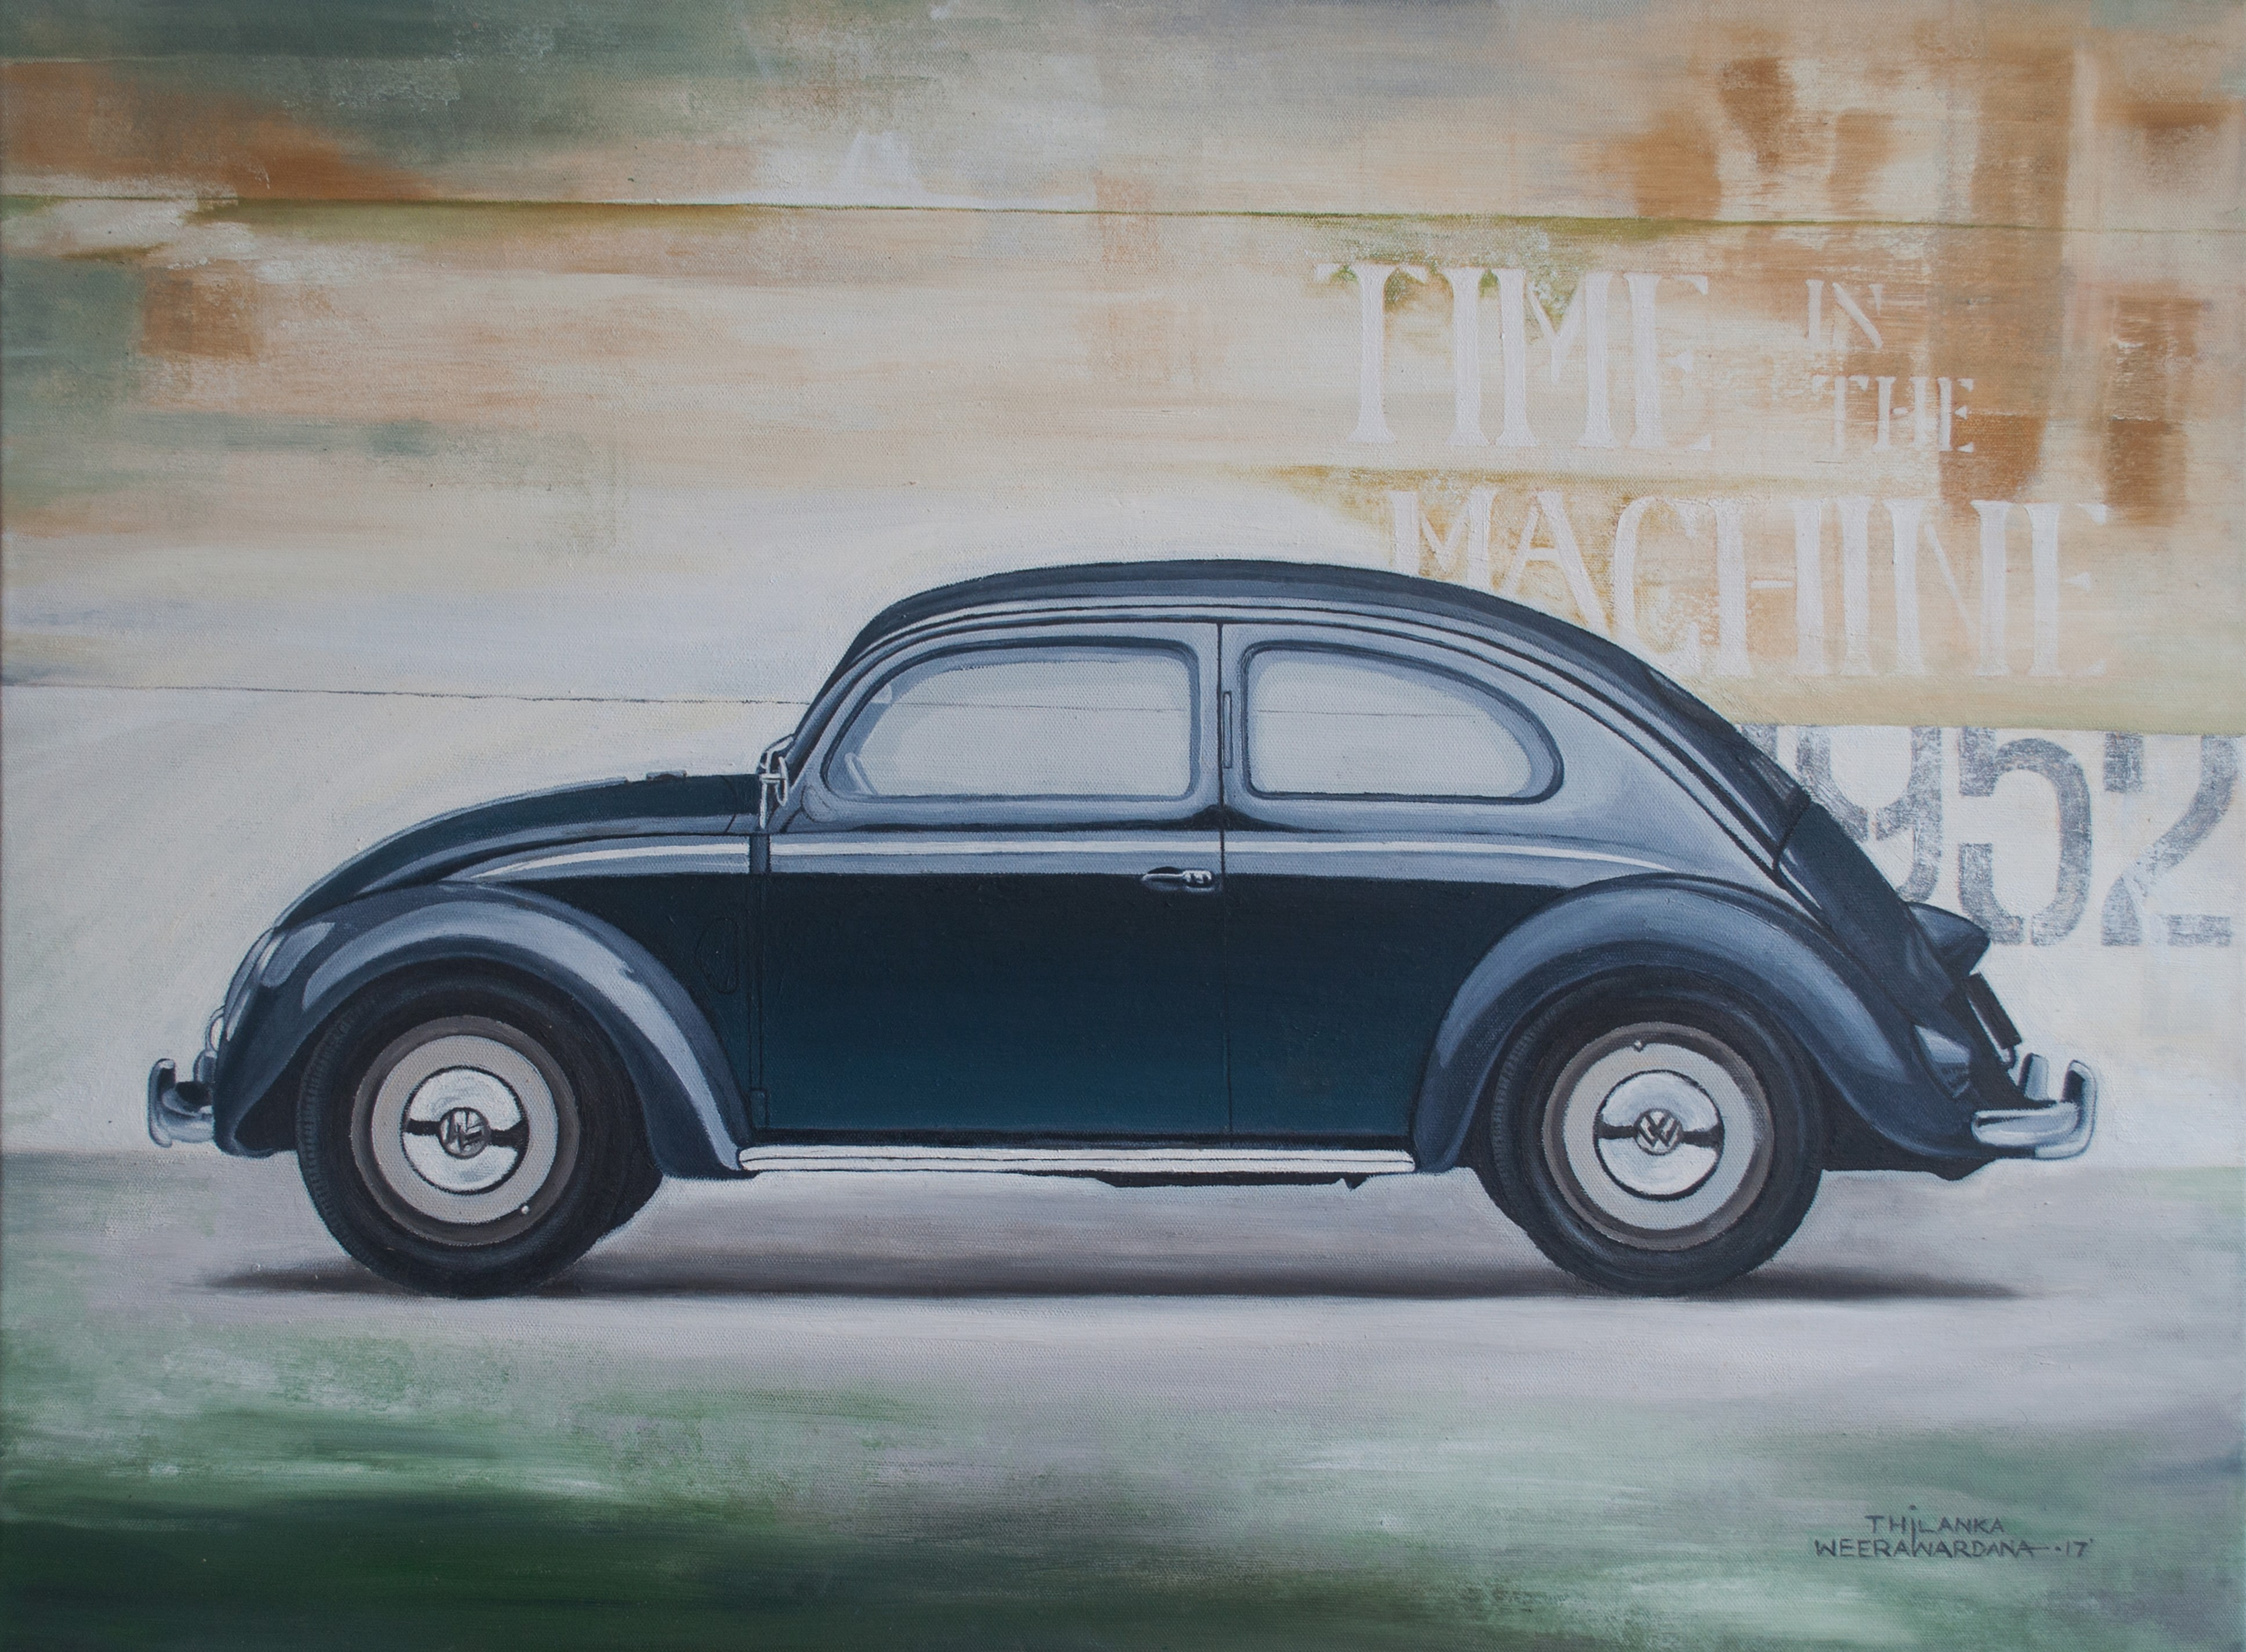 """Time (in the) machine"" Volkswag by Thilanka Weerawardana"